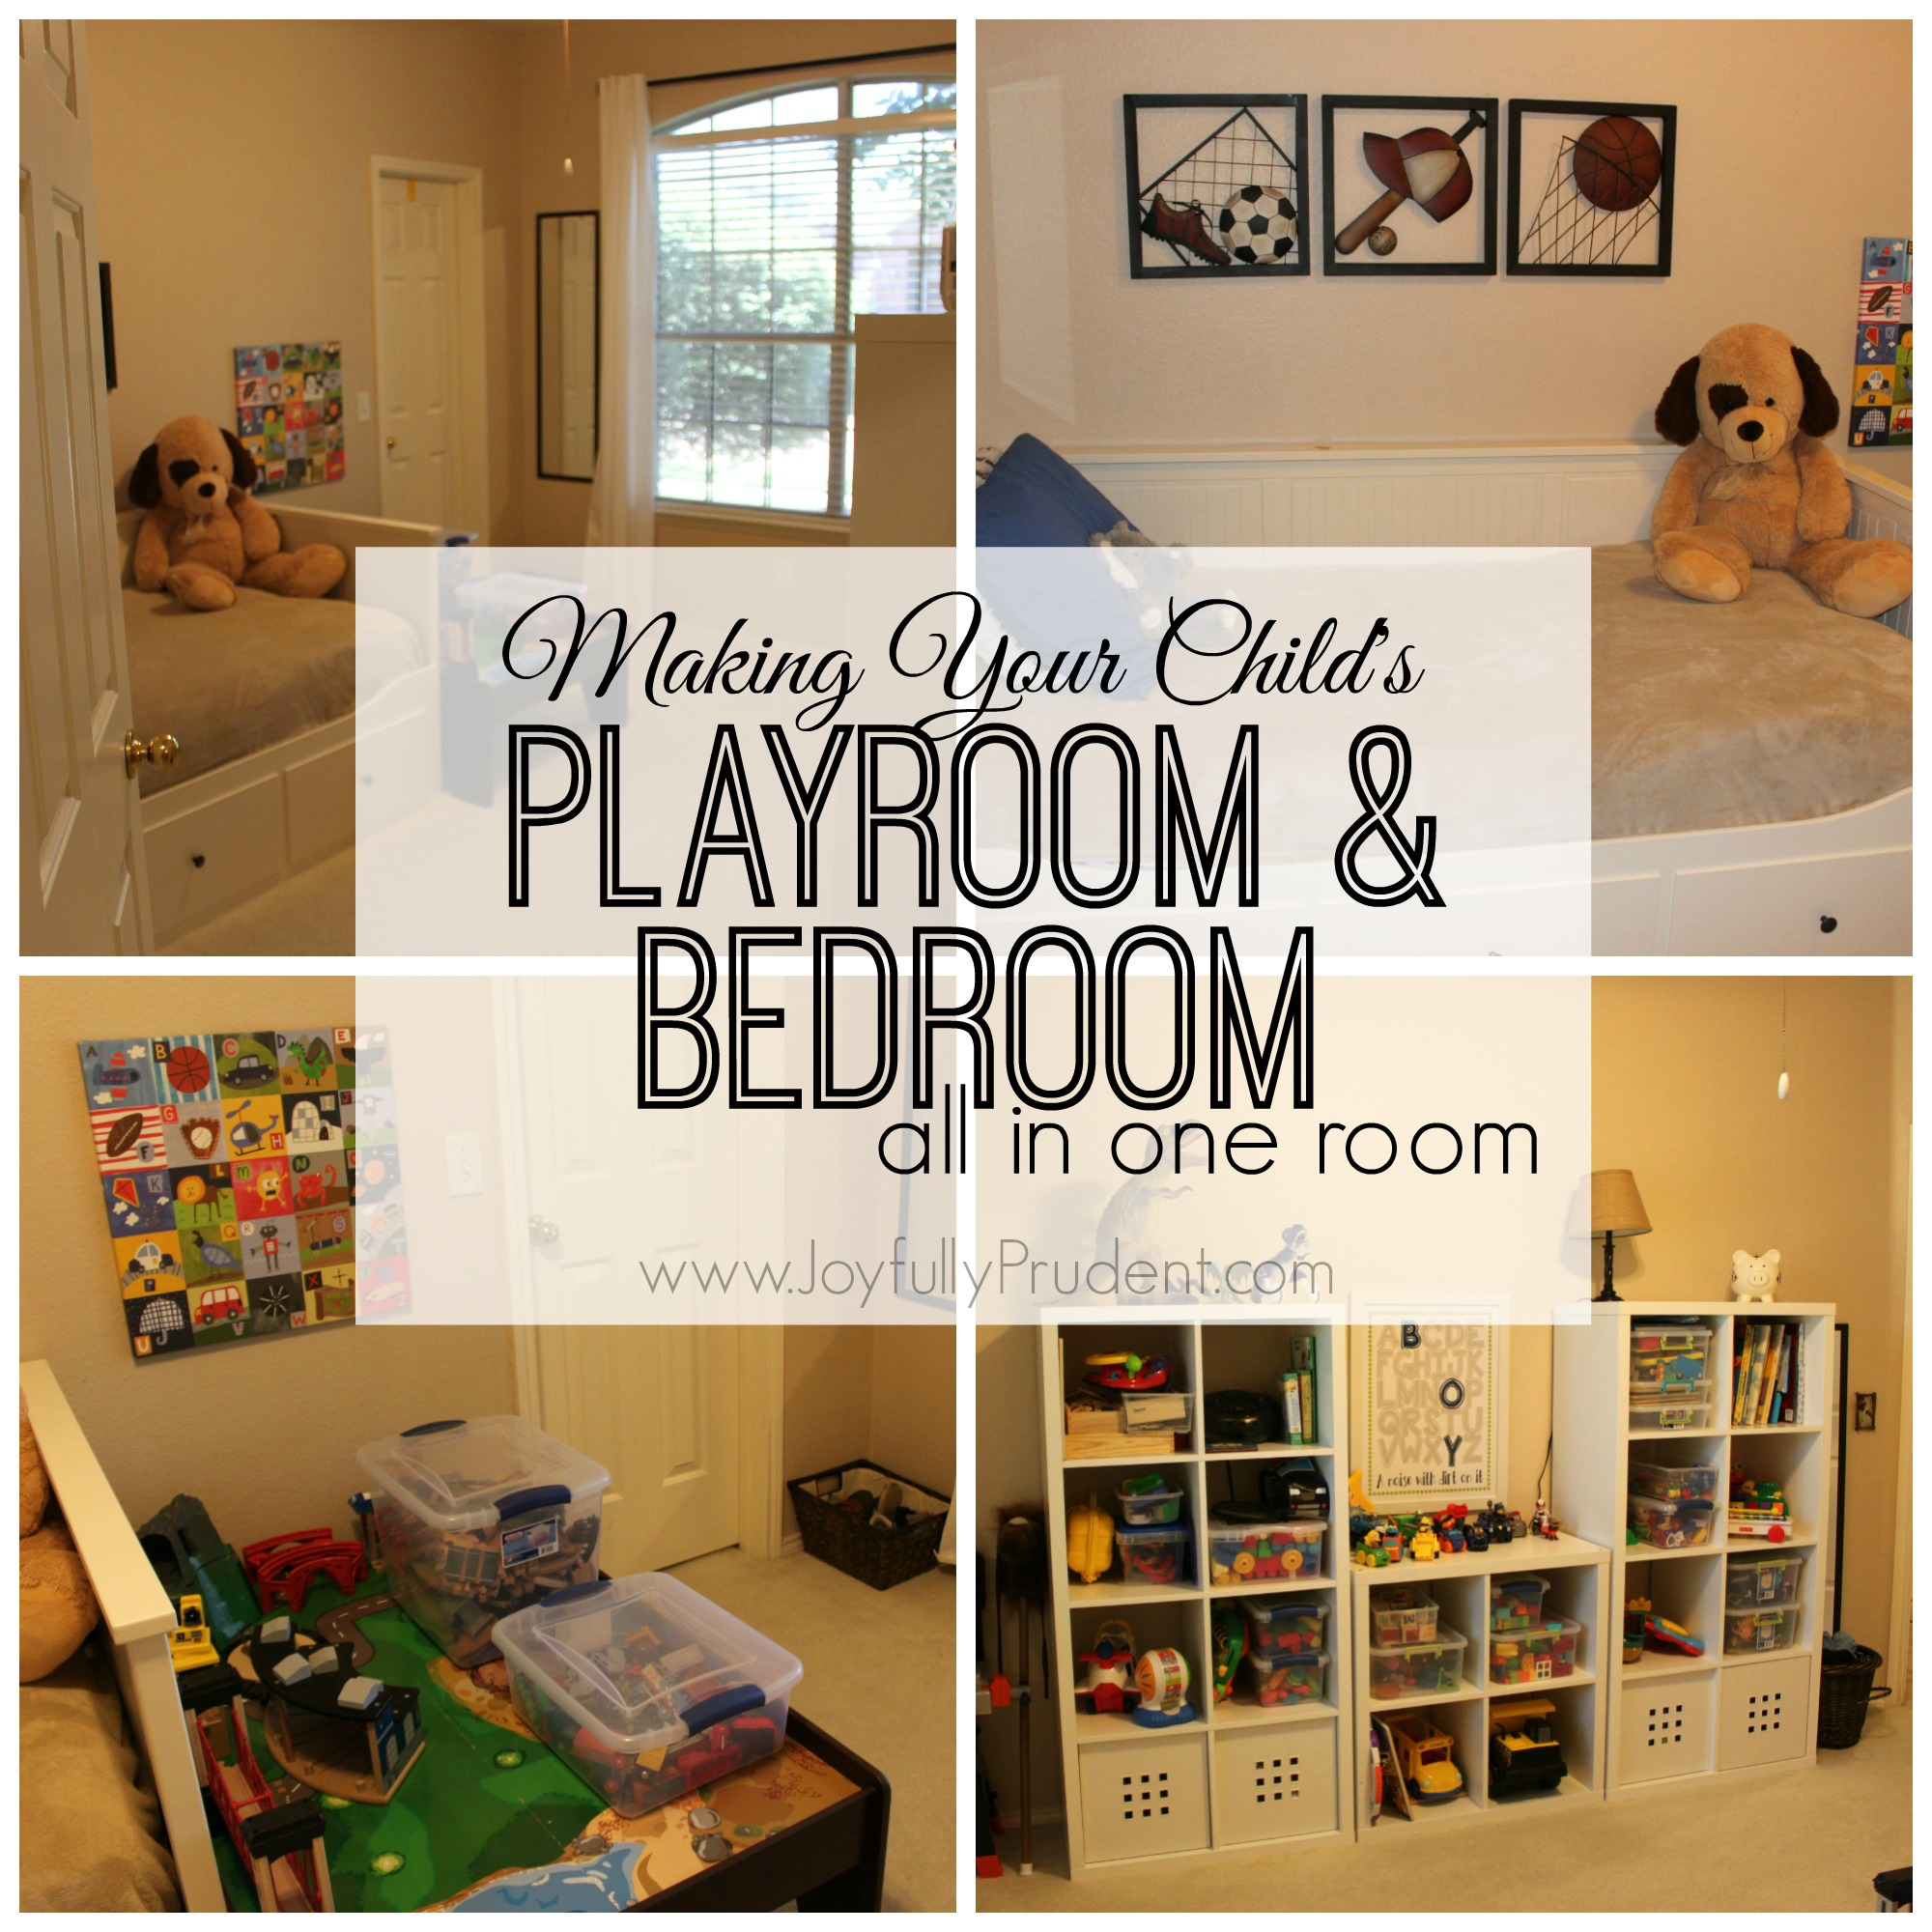 Playroom & Bedroom in One - Joyfully Prudent